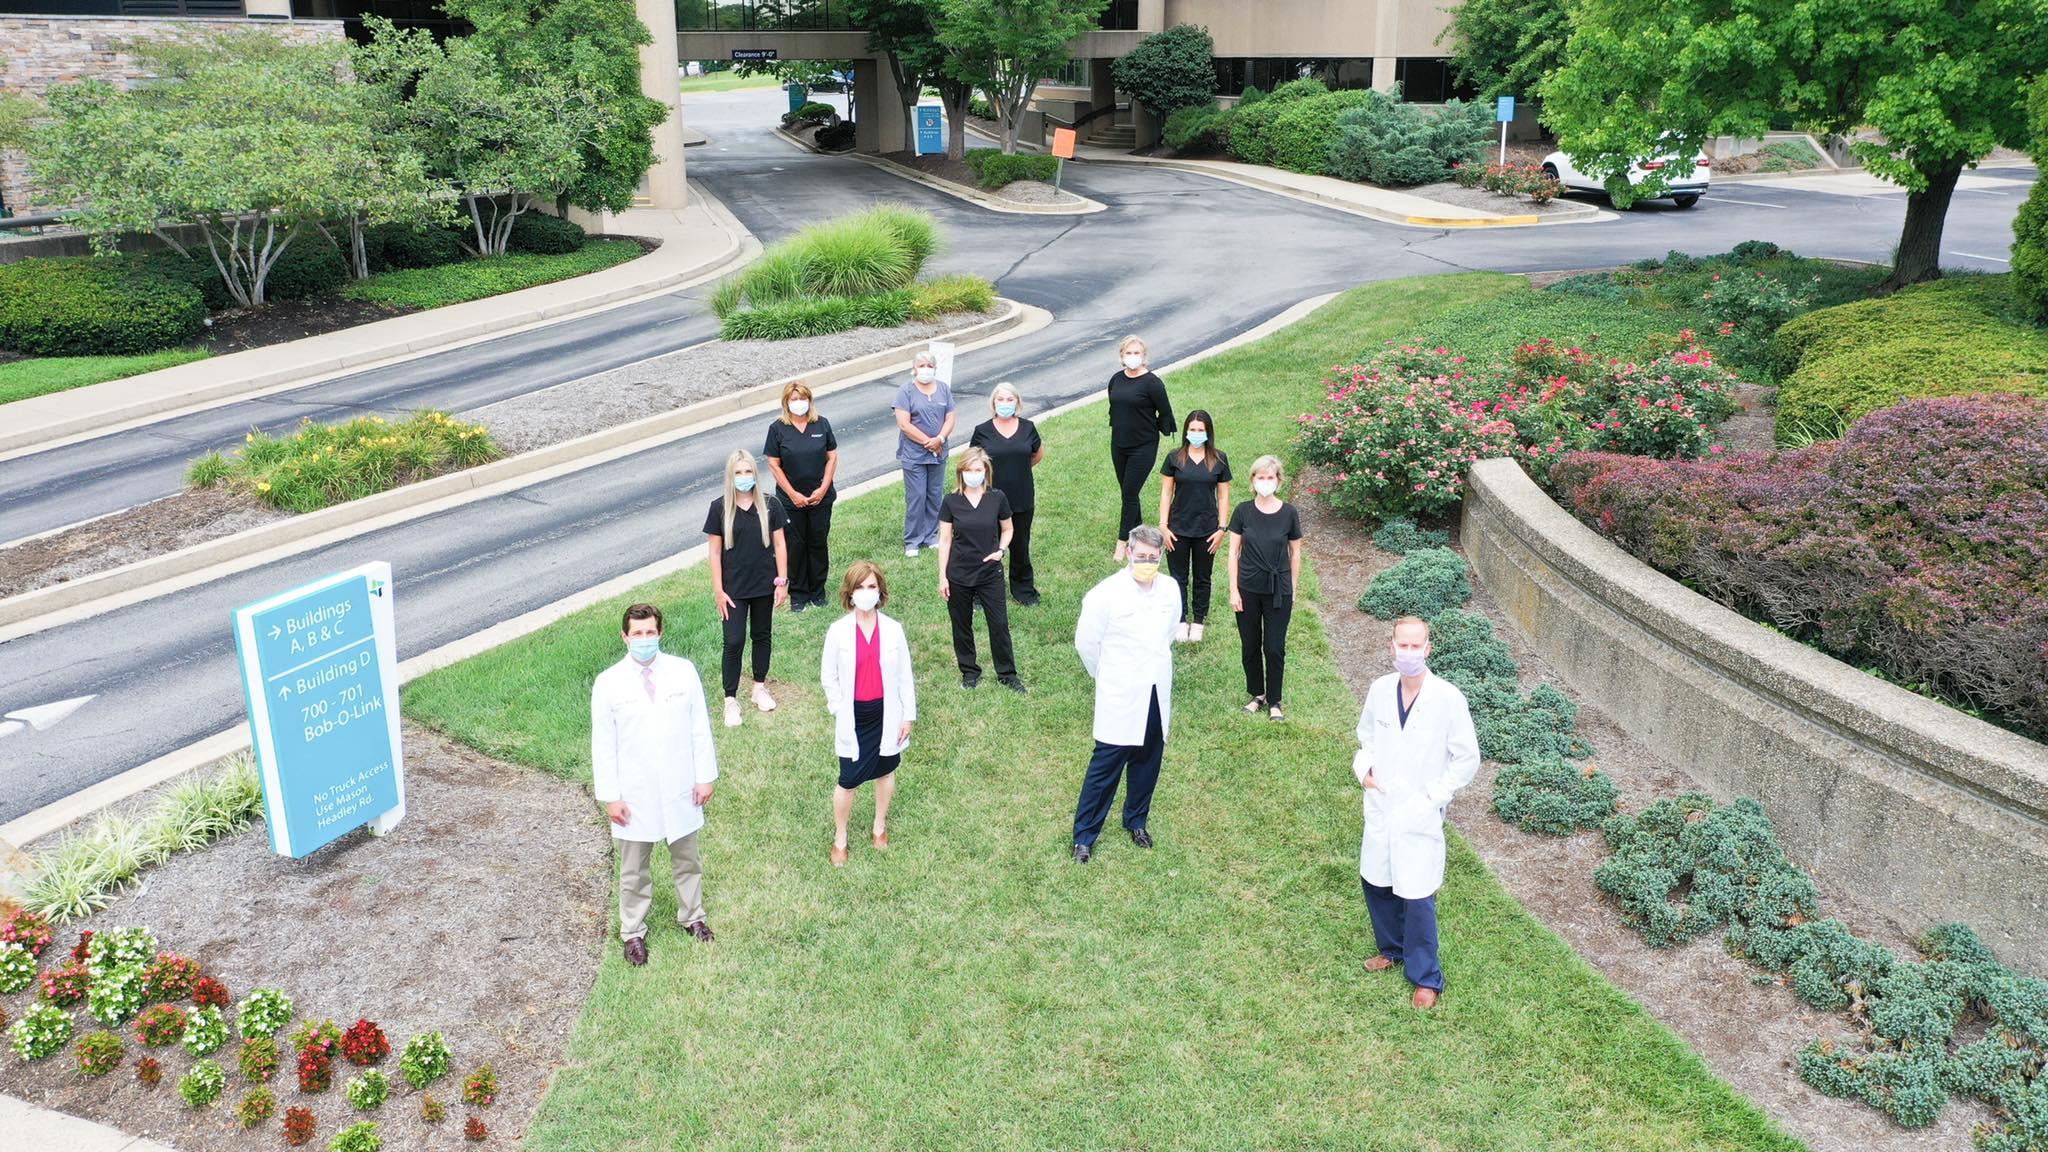 Plastic Surgeons of Lexington Owner